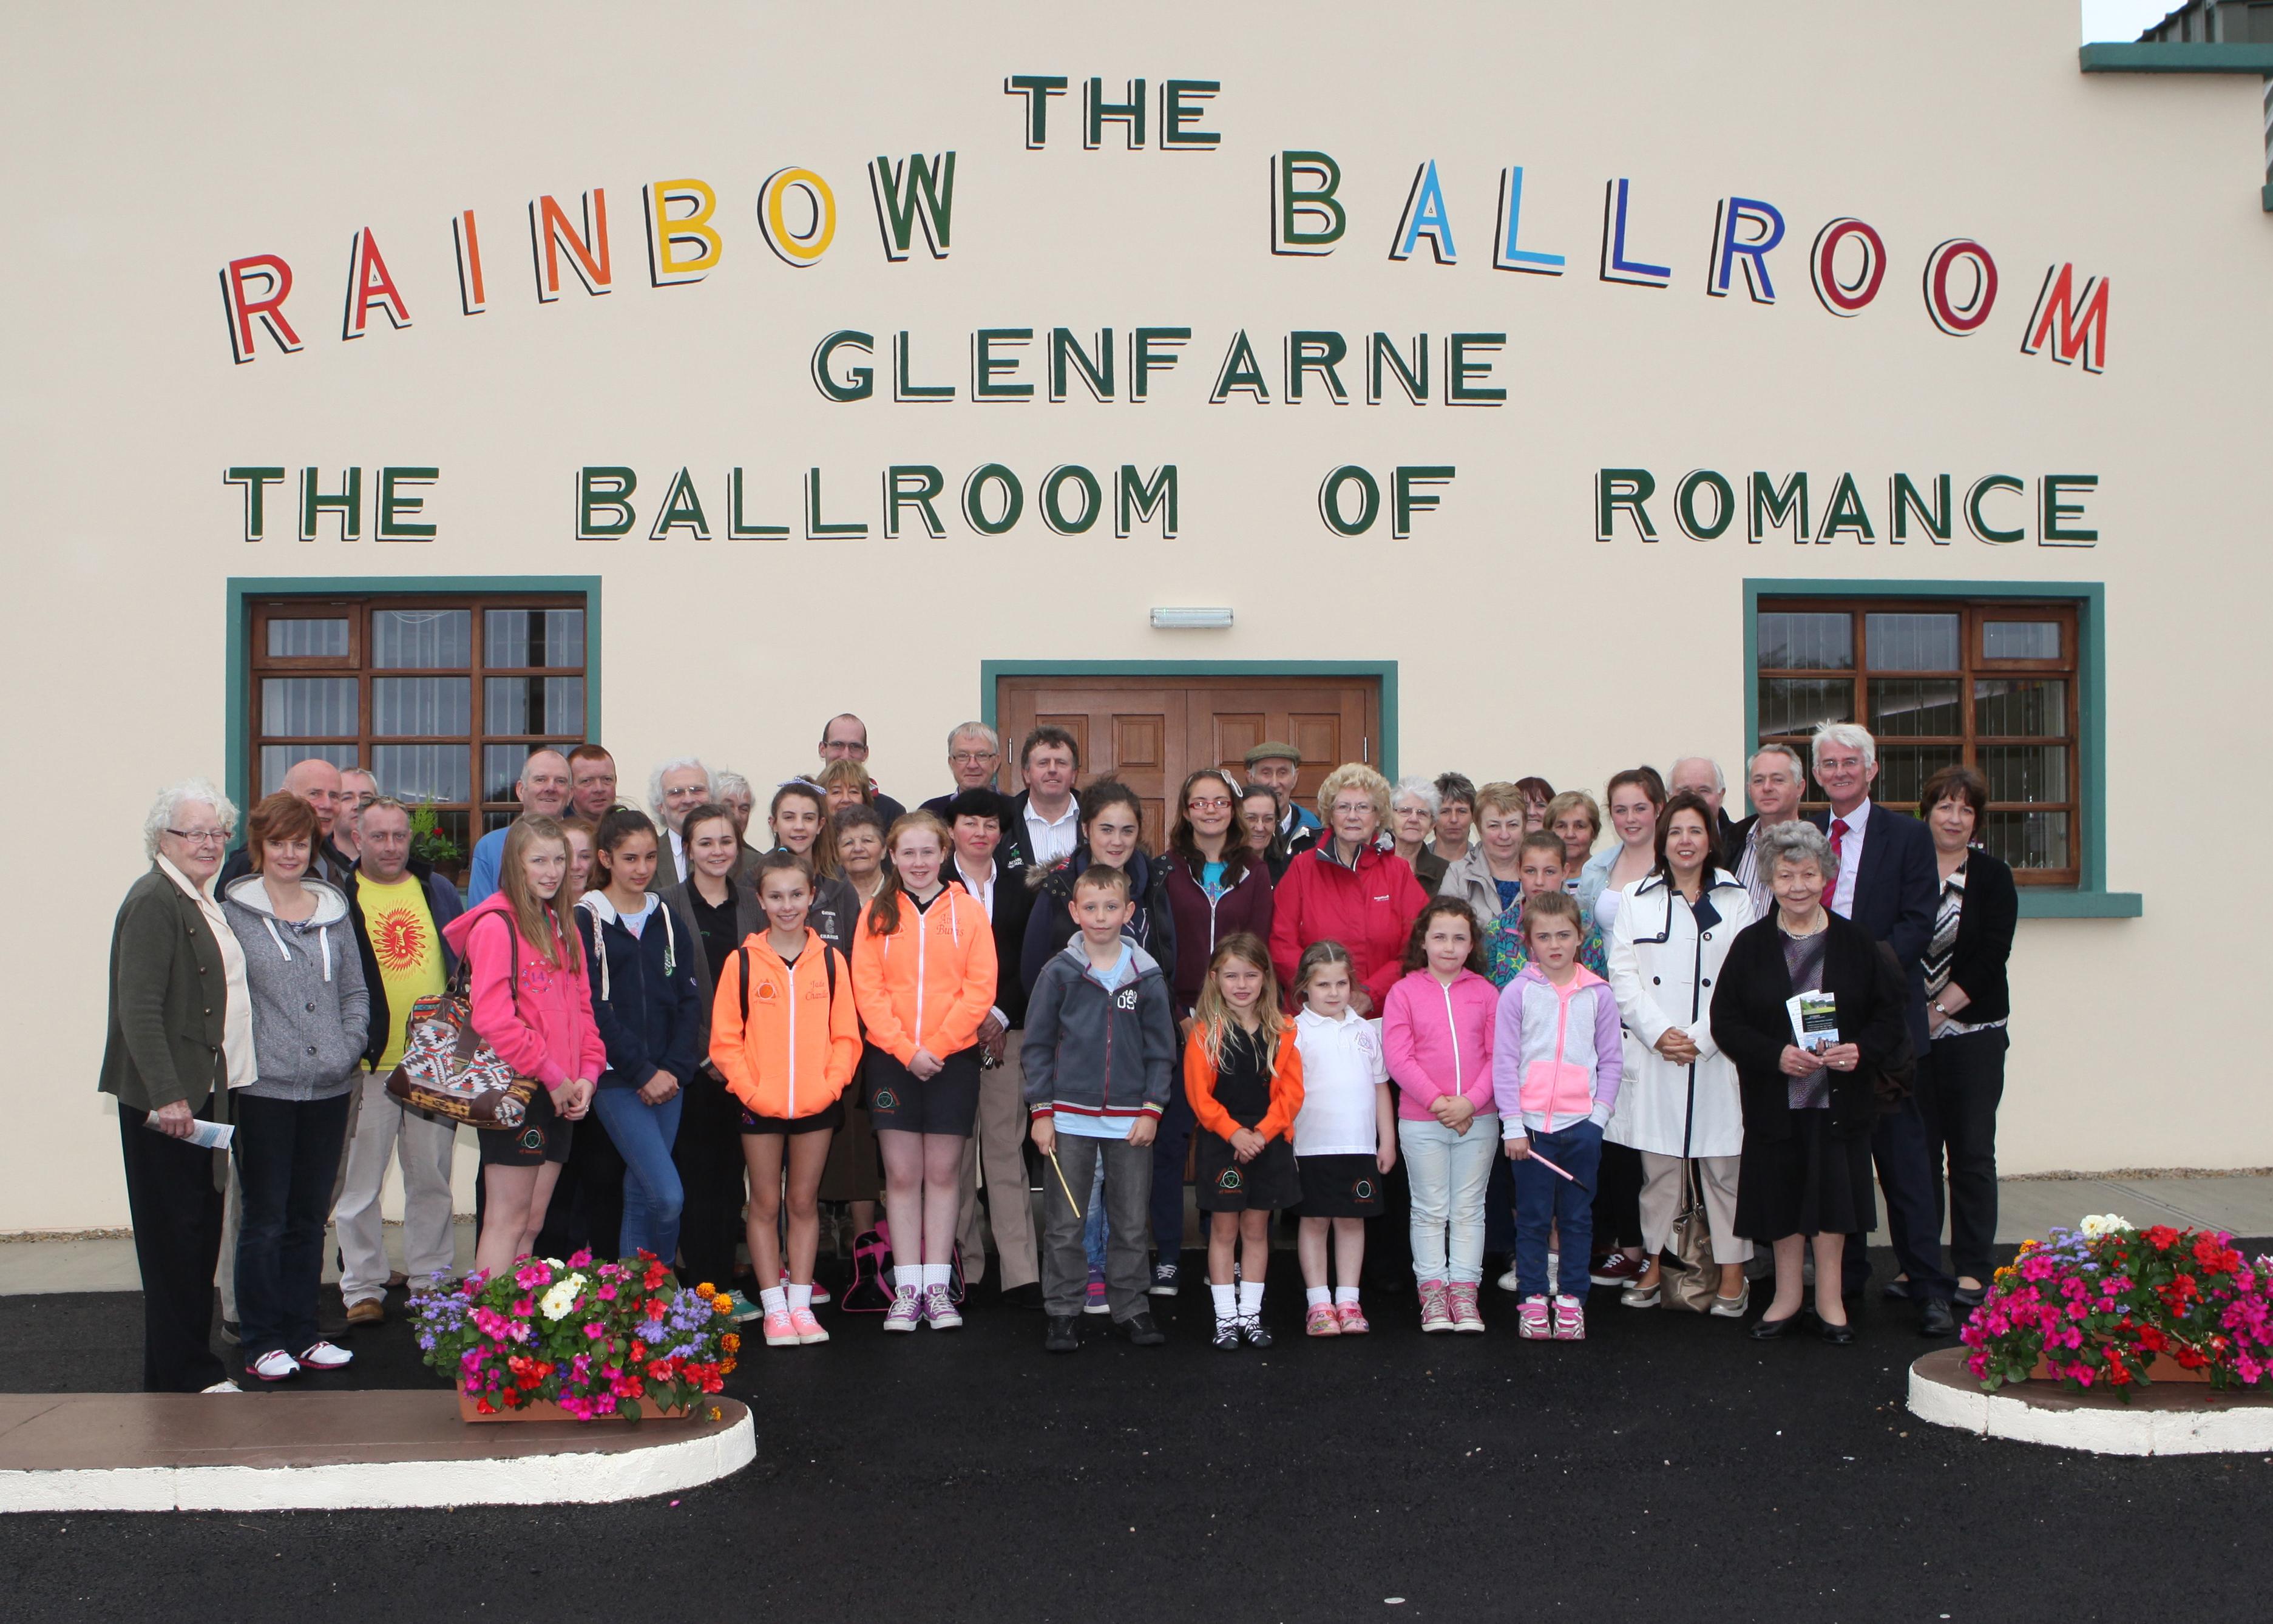 Glenfarne Ballroom of Romance